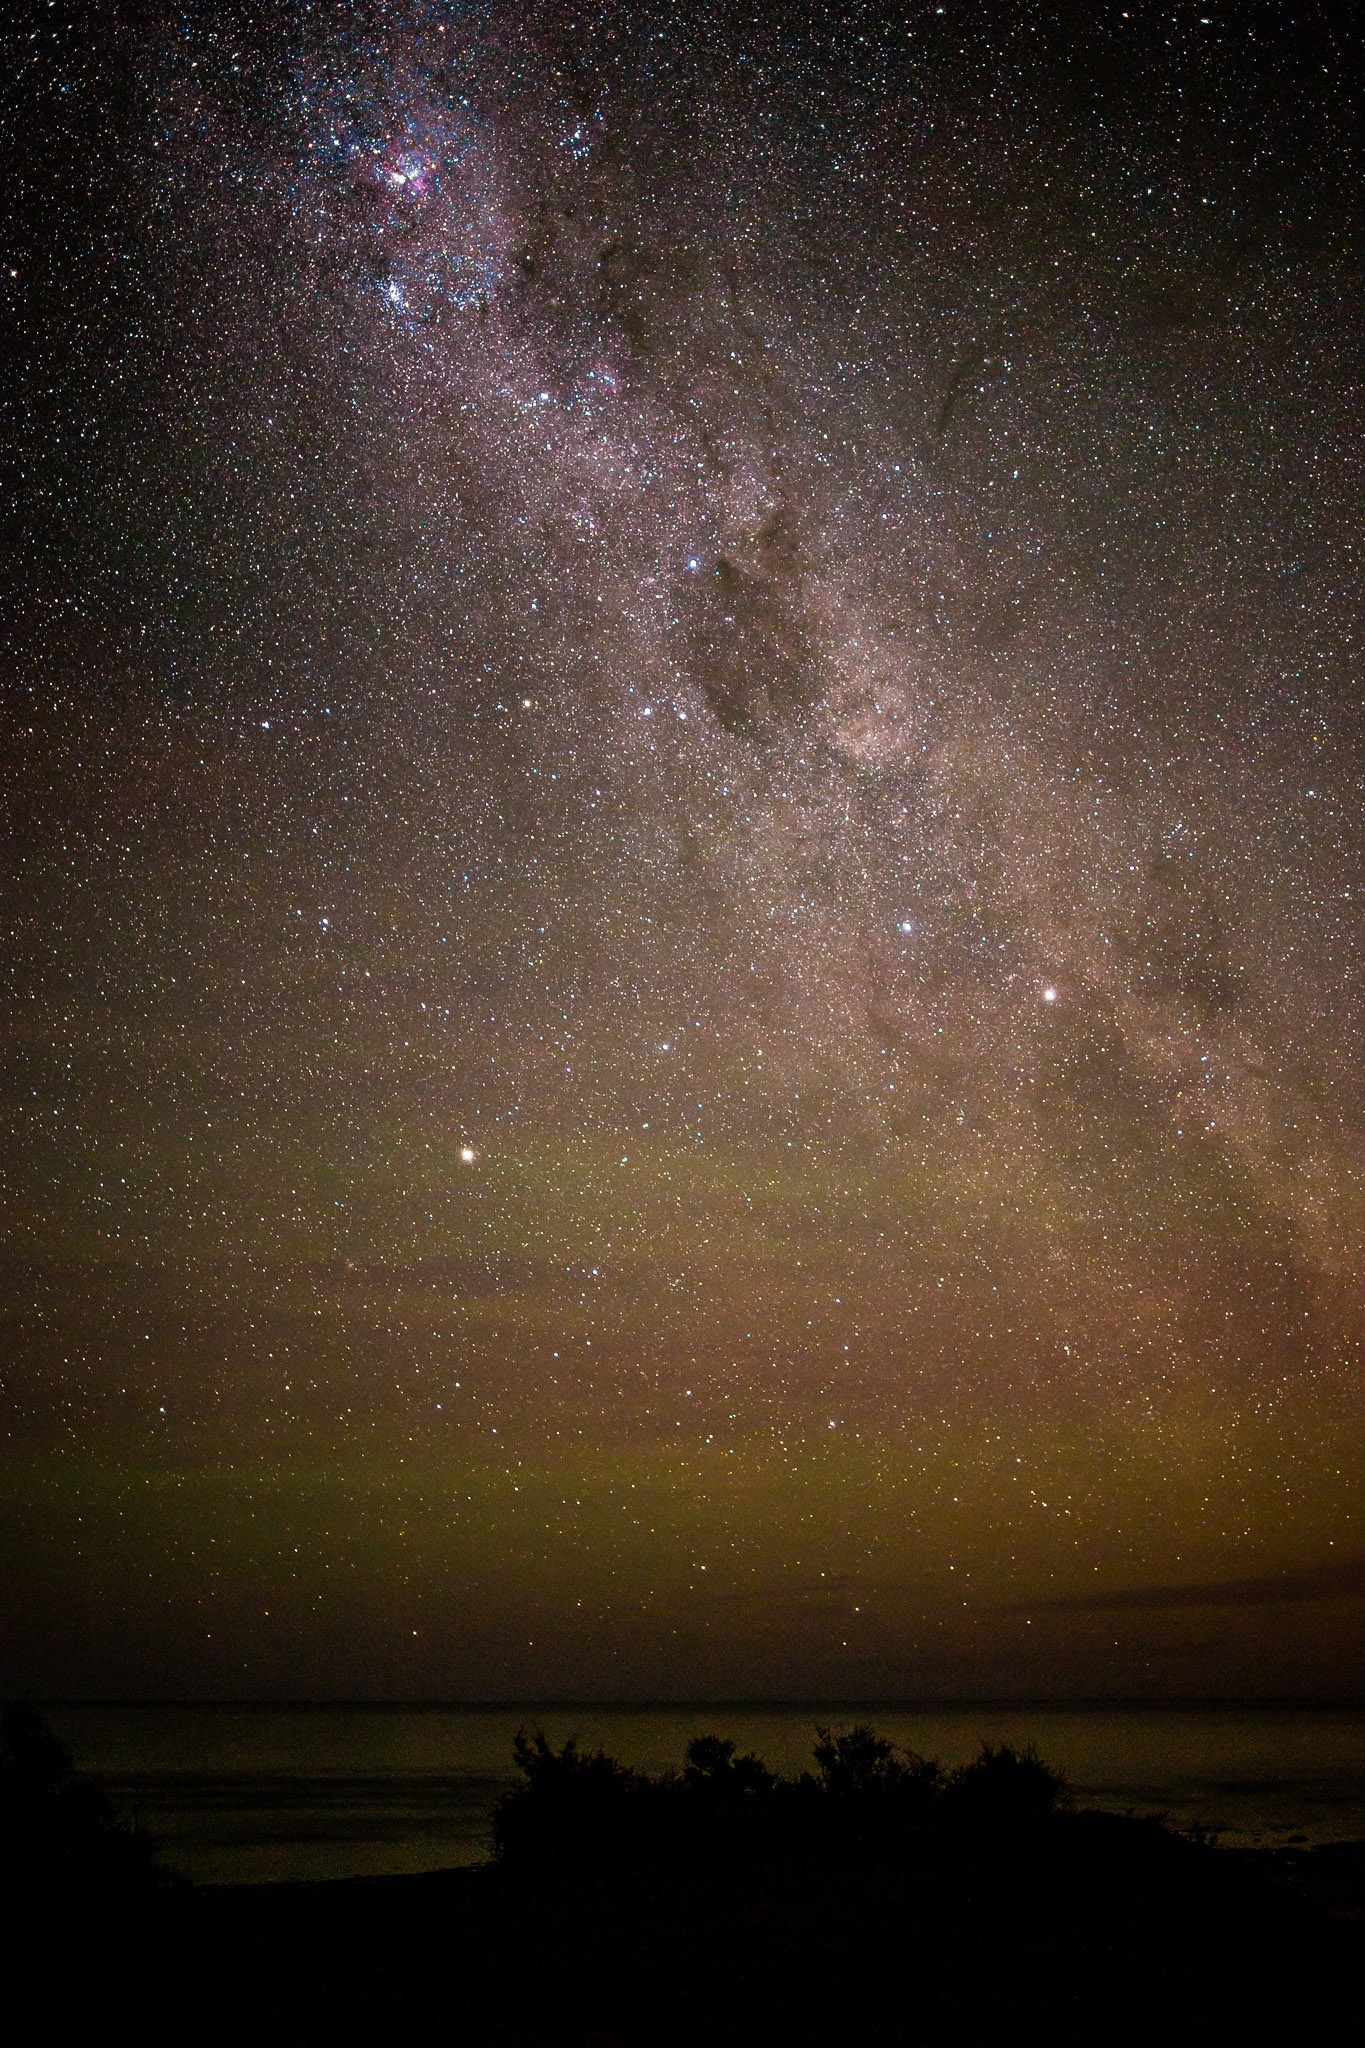 wedding-travellers-argentina-nigh-sky-stars-milky-way